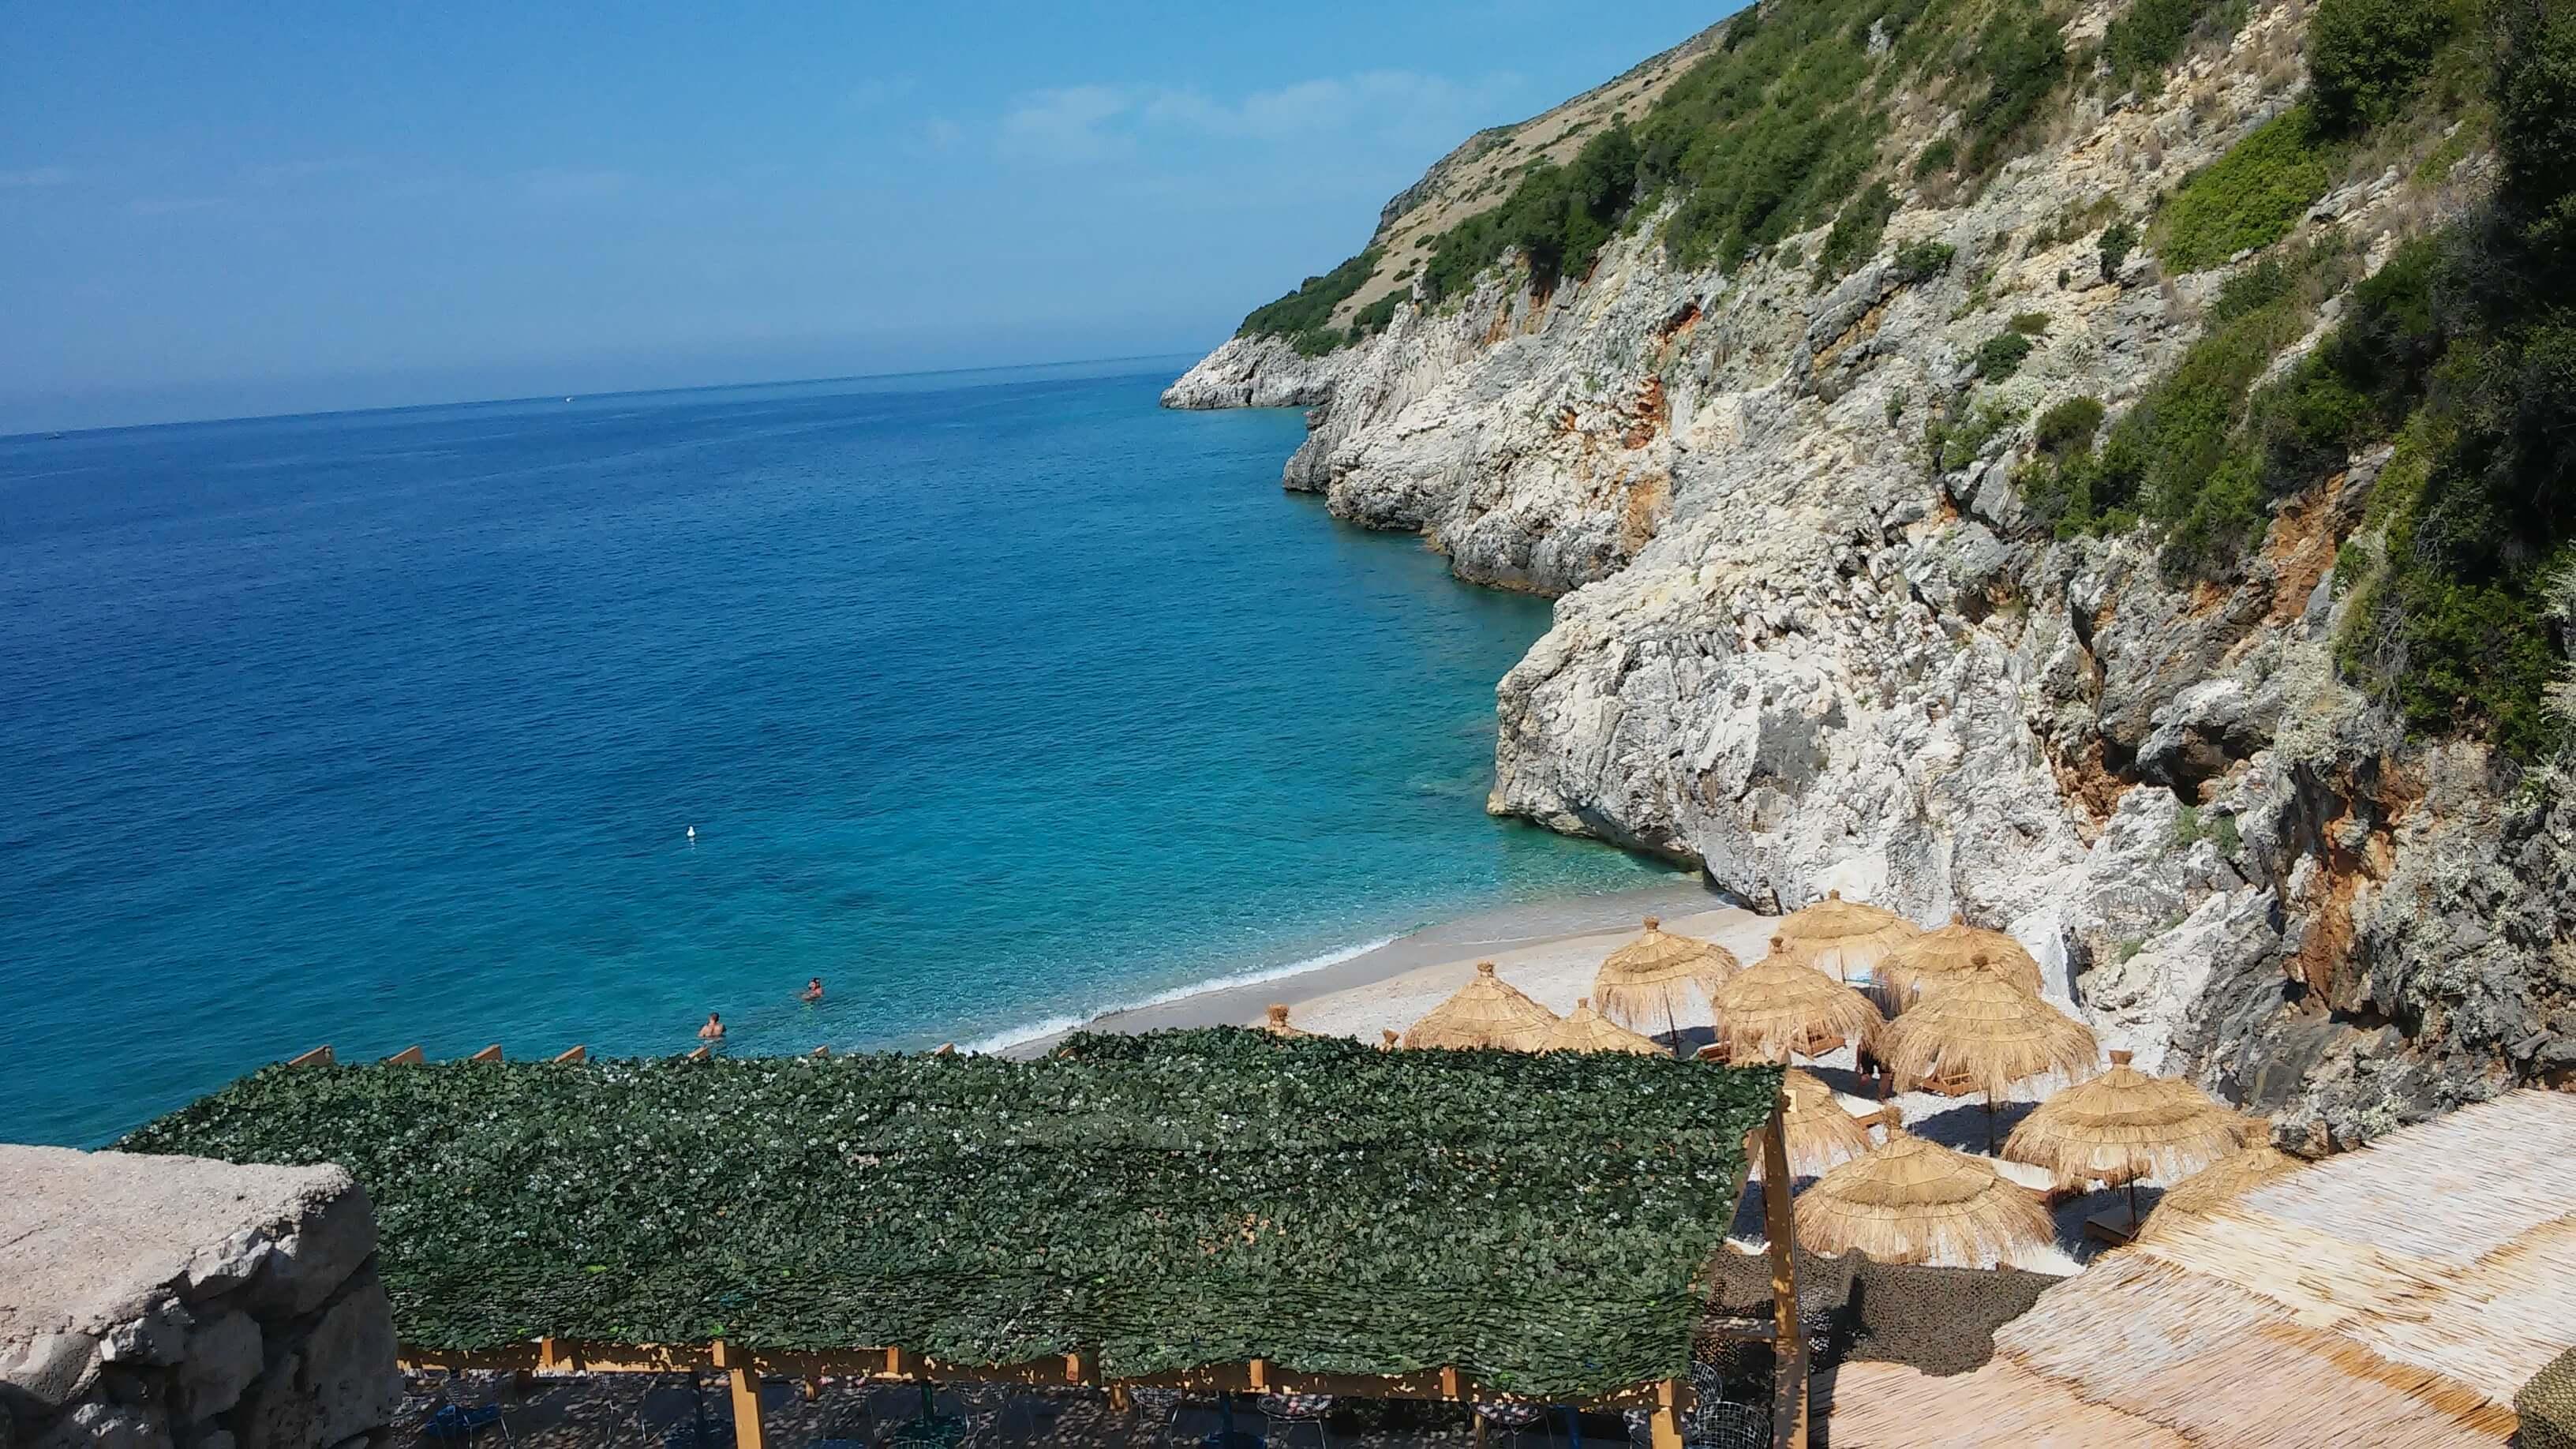 Spiaggia Jal Albania